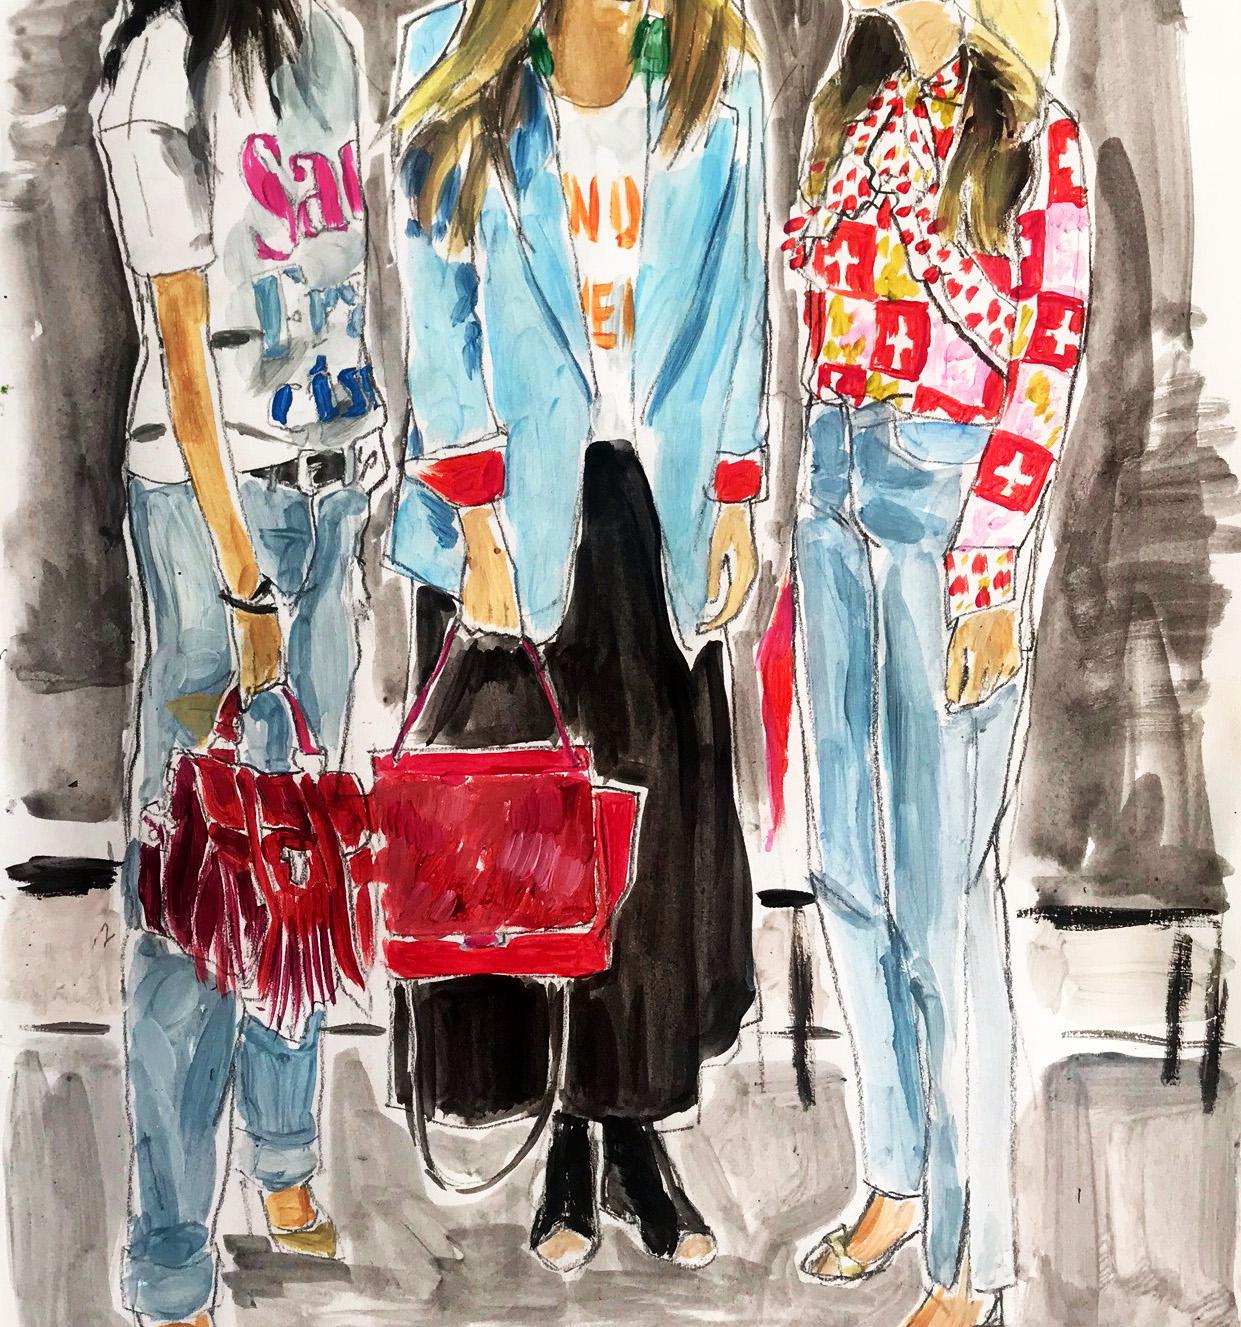 copenhagen fashion week 2017 - selfish wardrobe.jpg